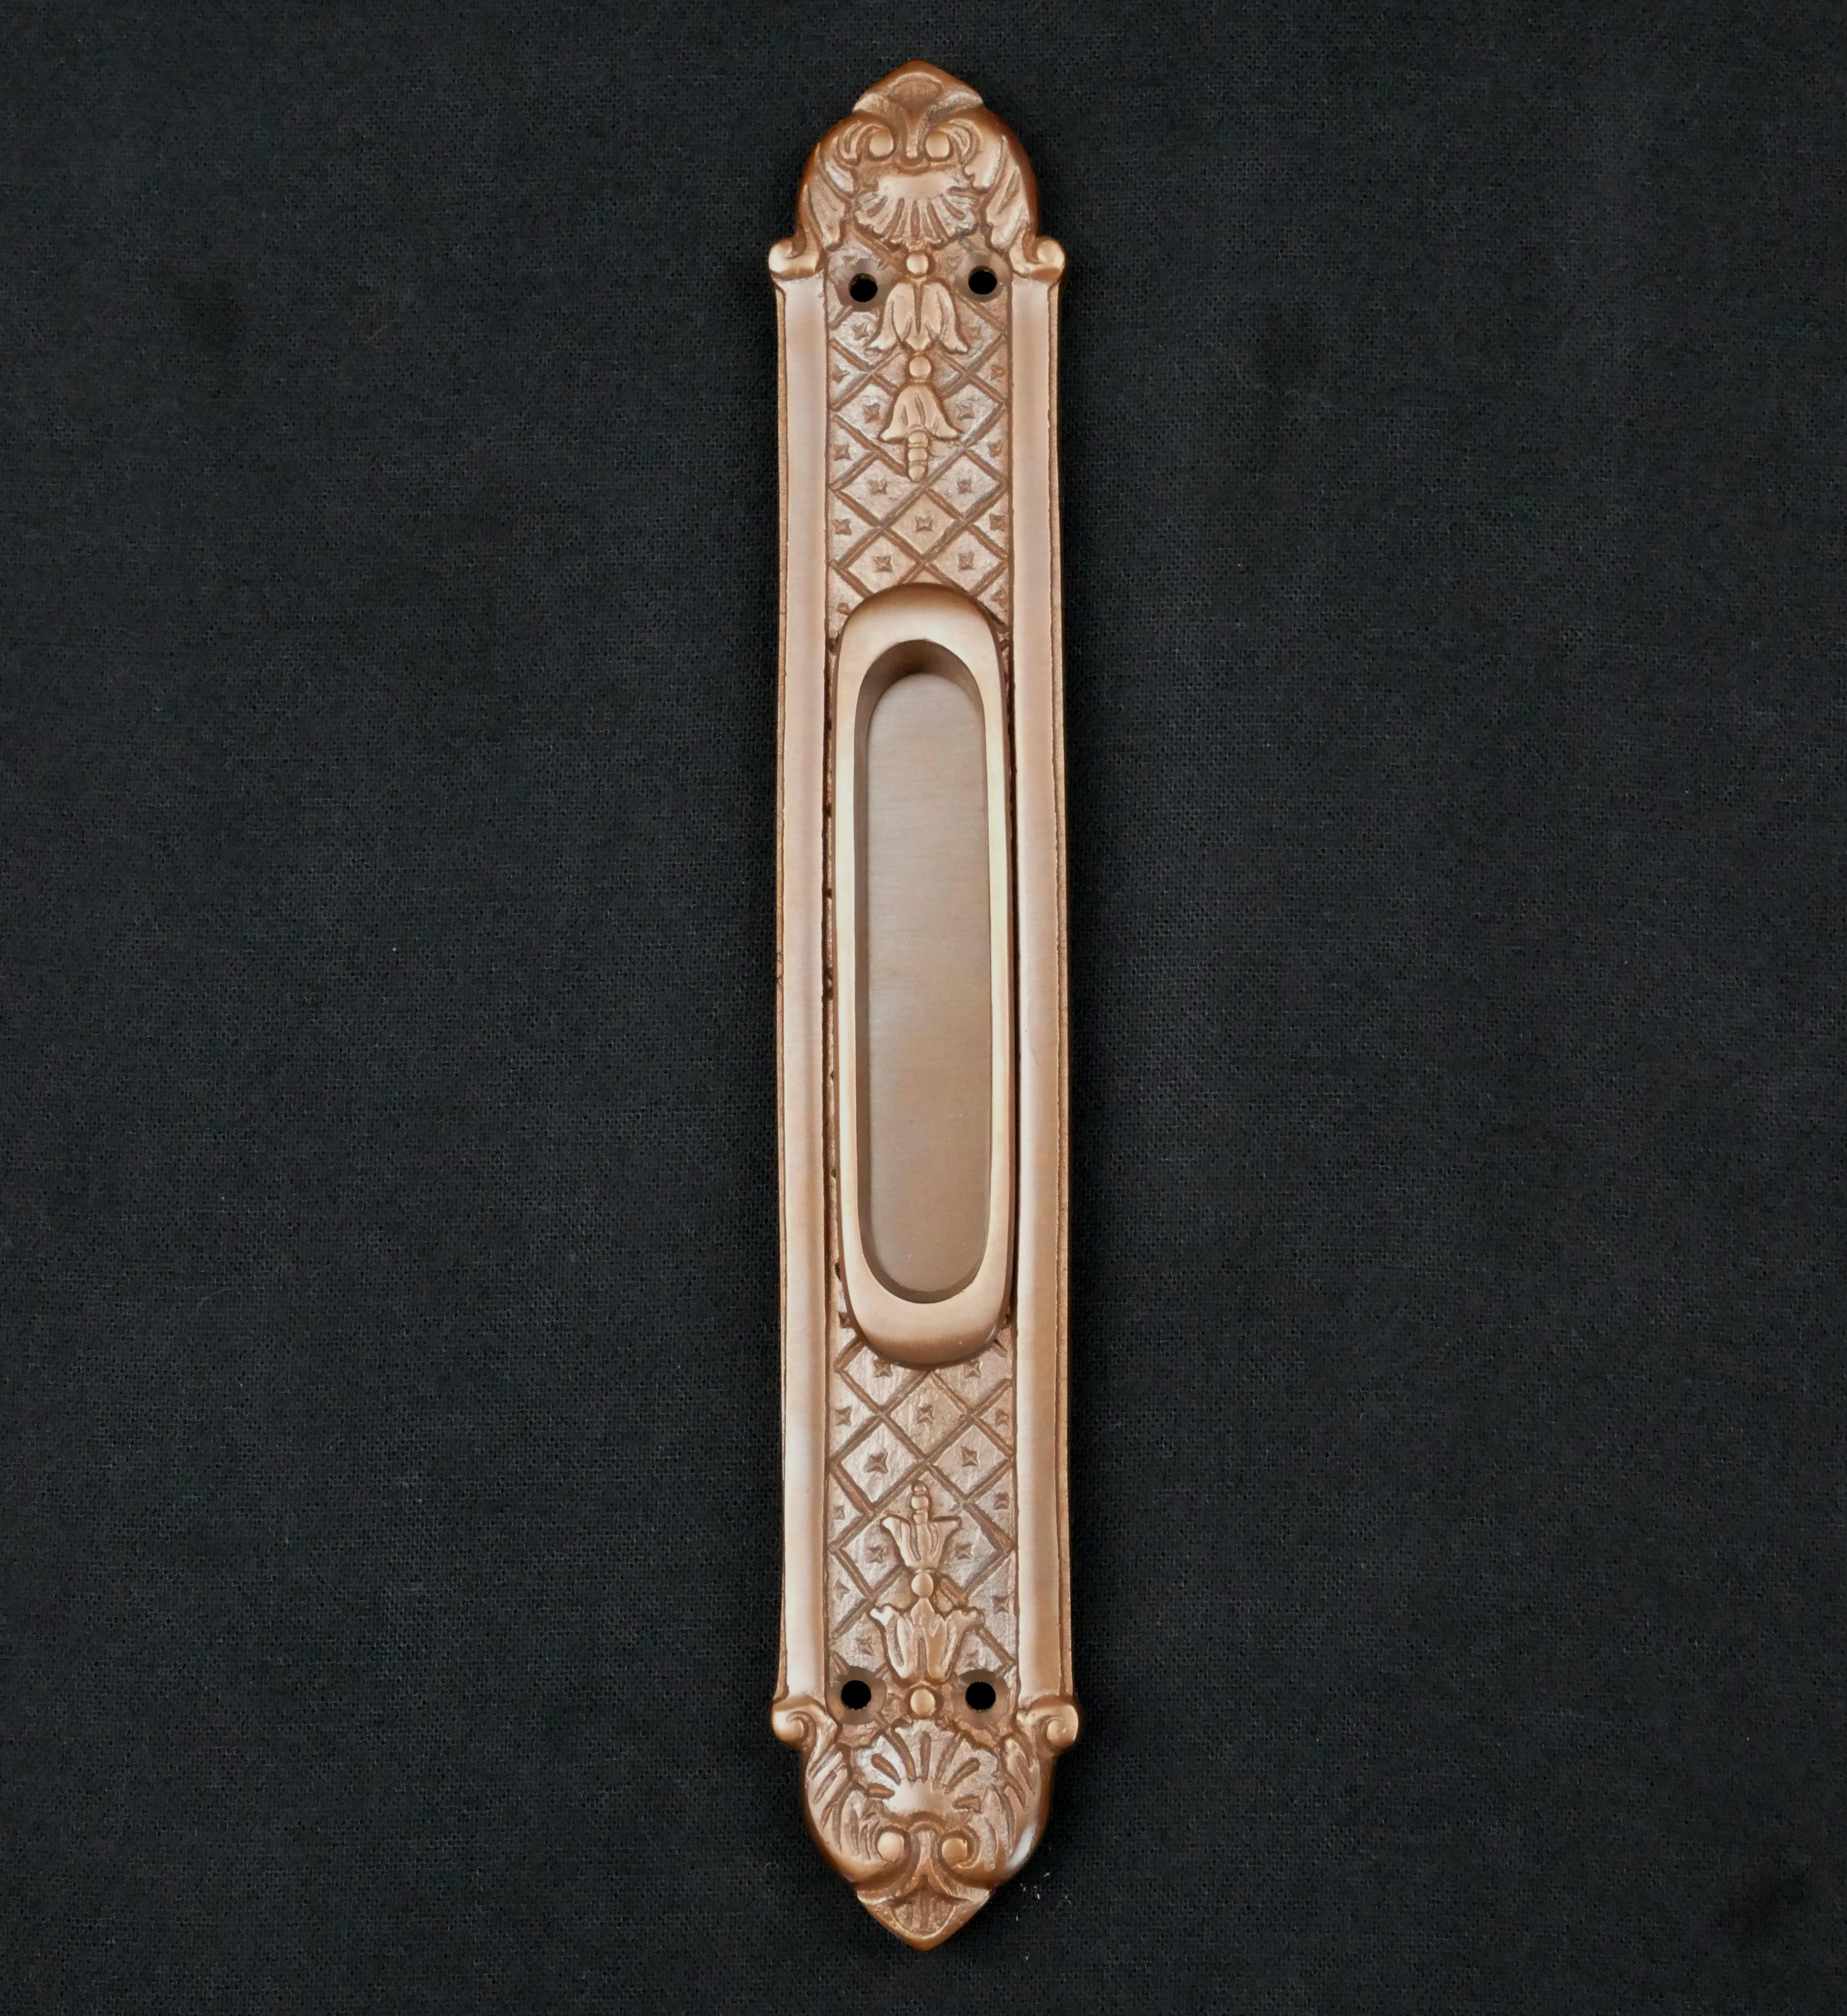 325.0028.45 Schiebetürmuschel - antike Türmuschel